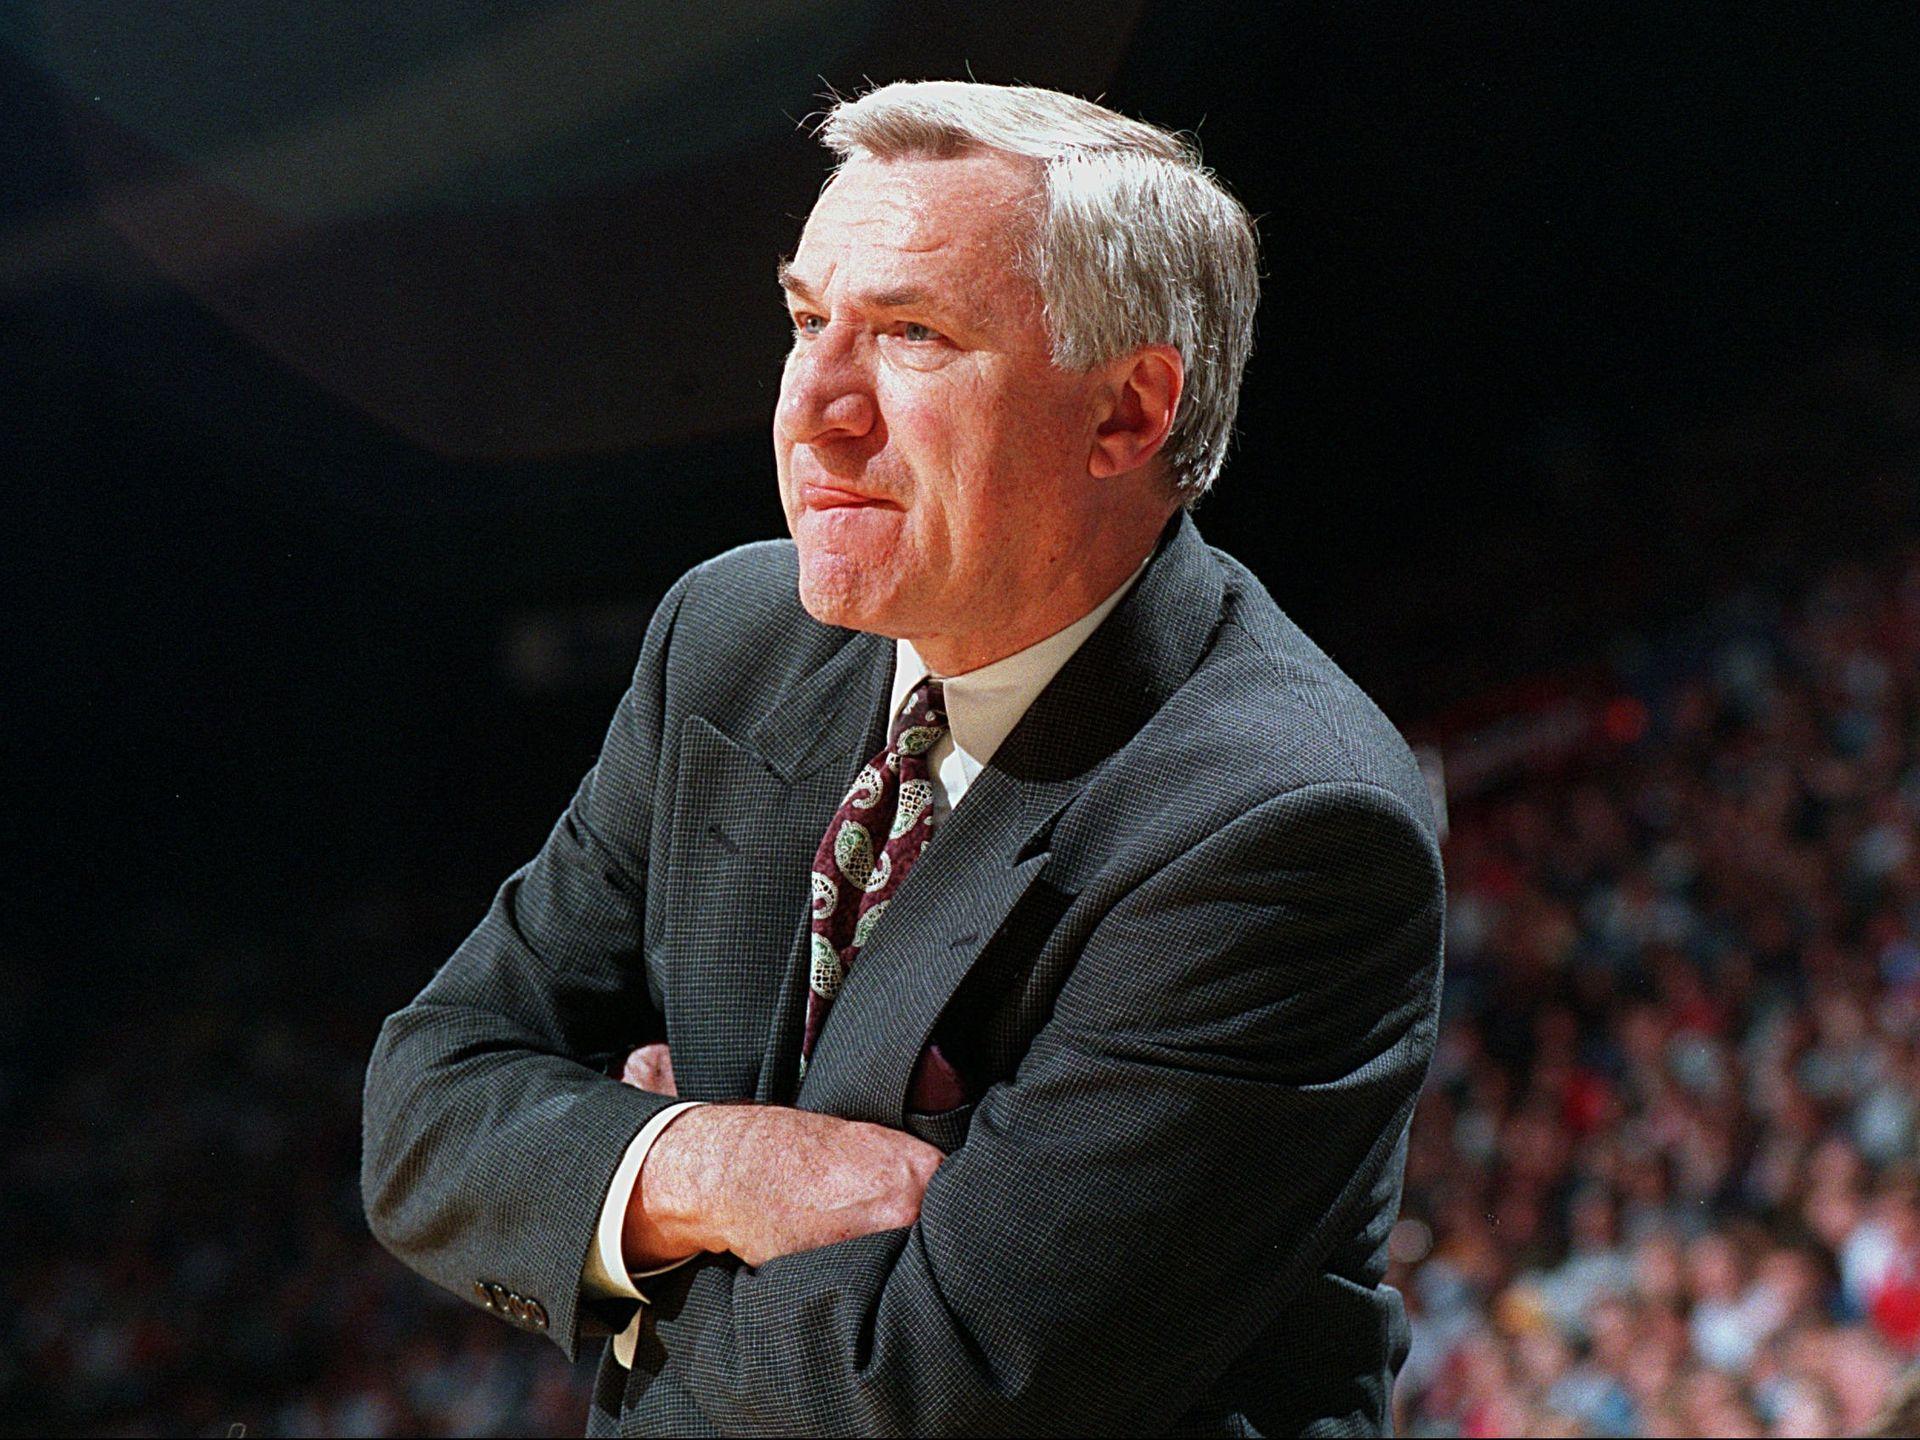 Legendary North Carolina coach Dean Smith dies at 83